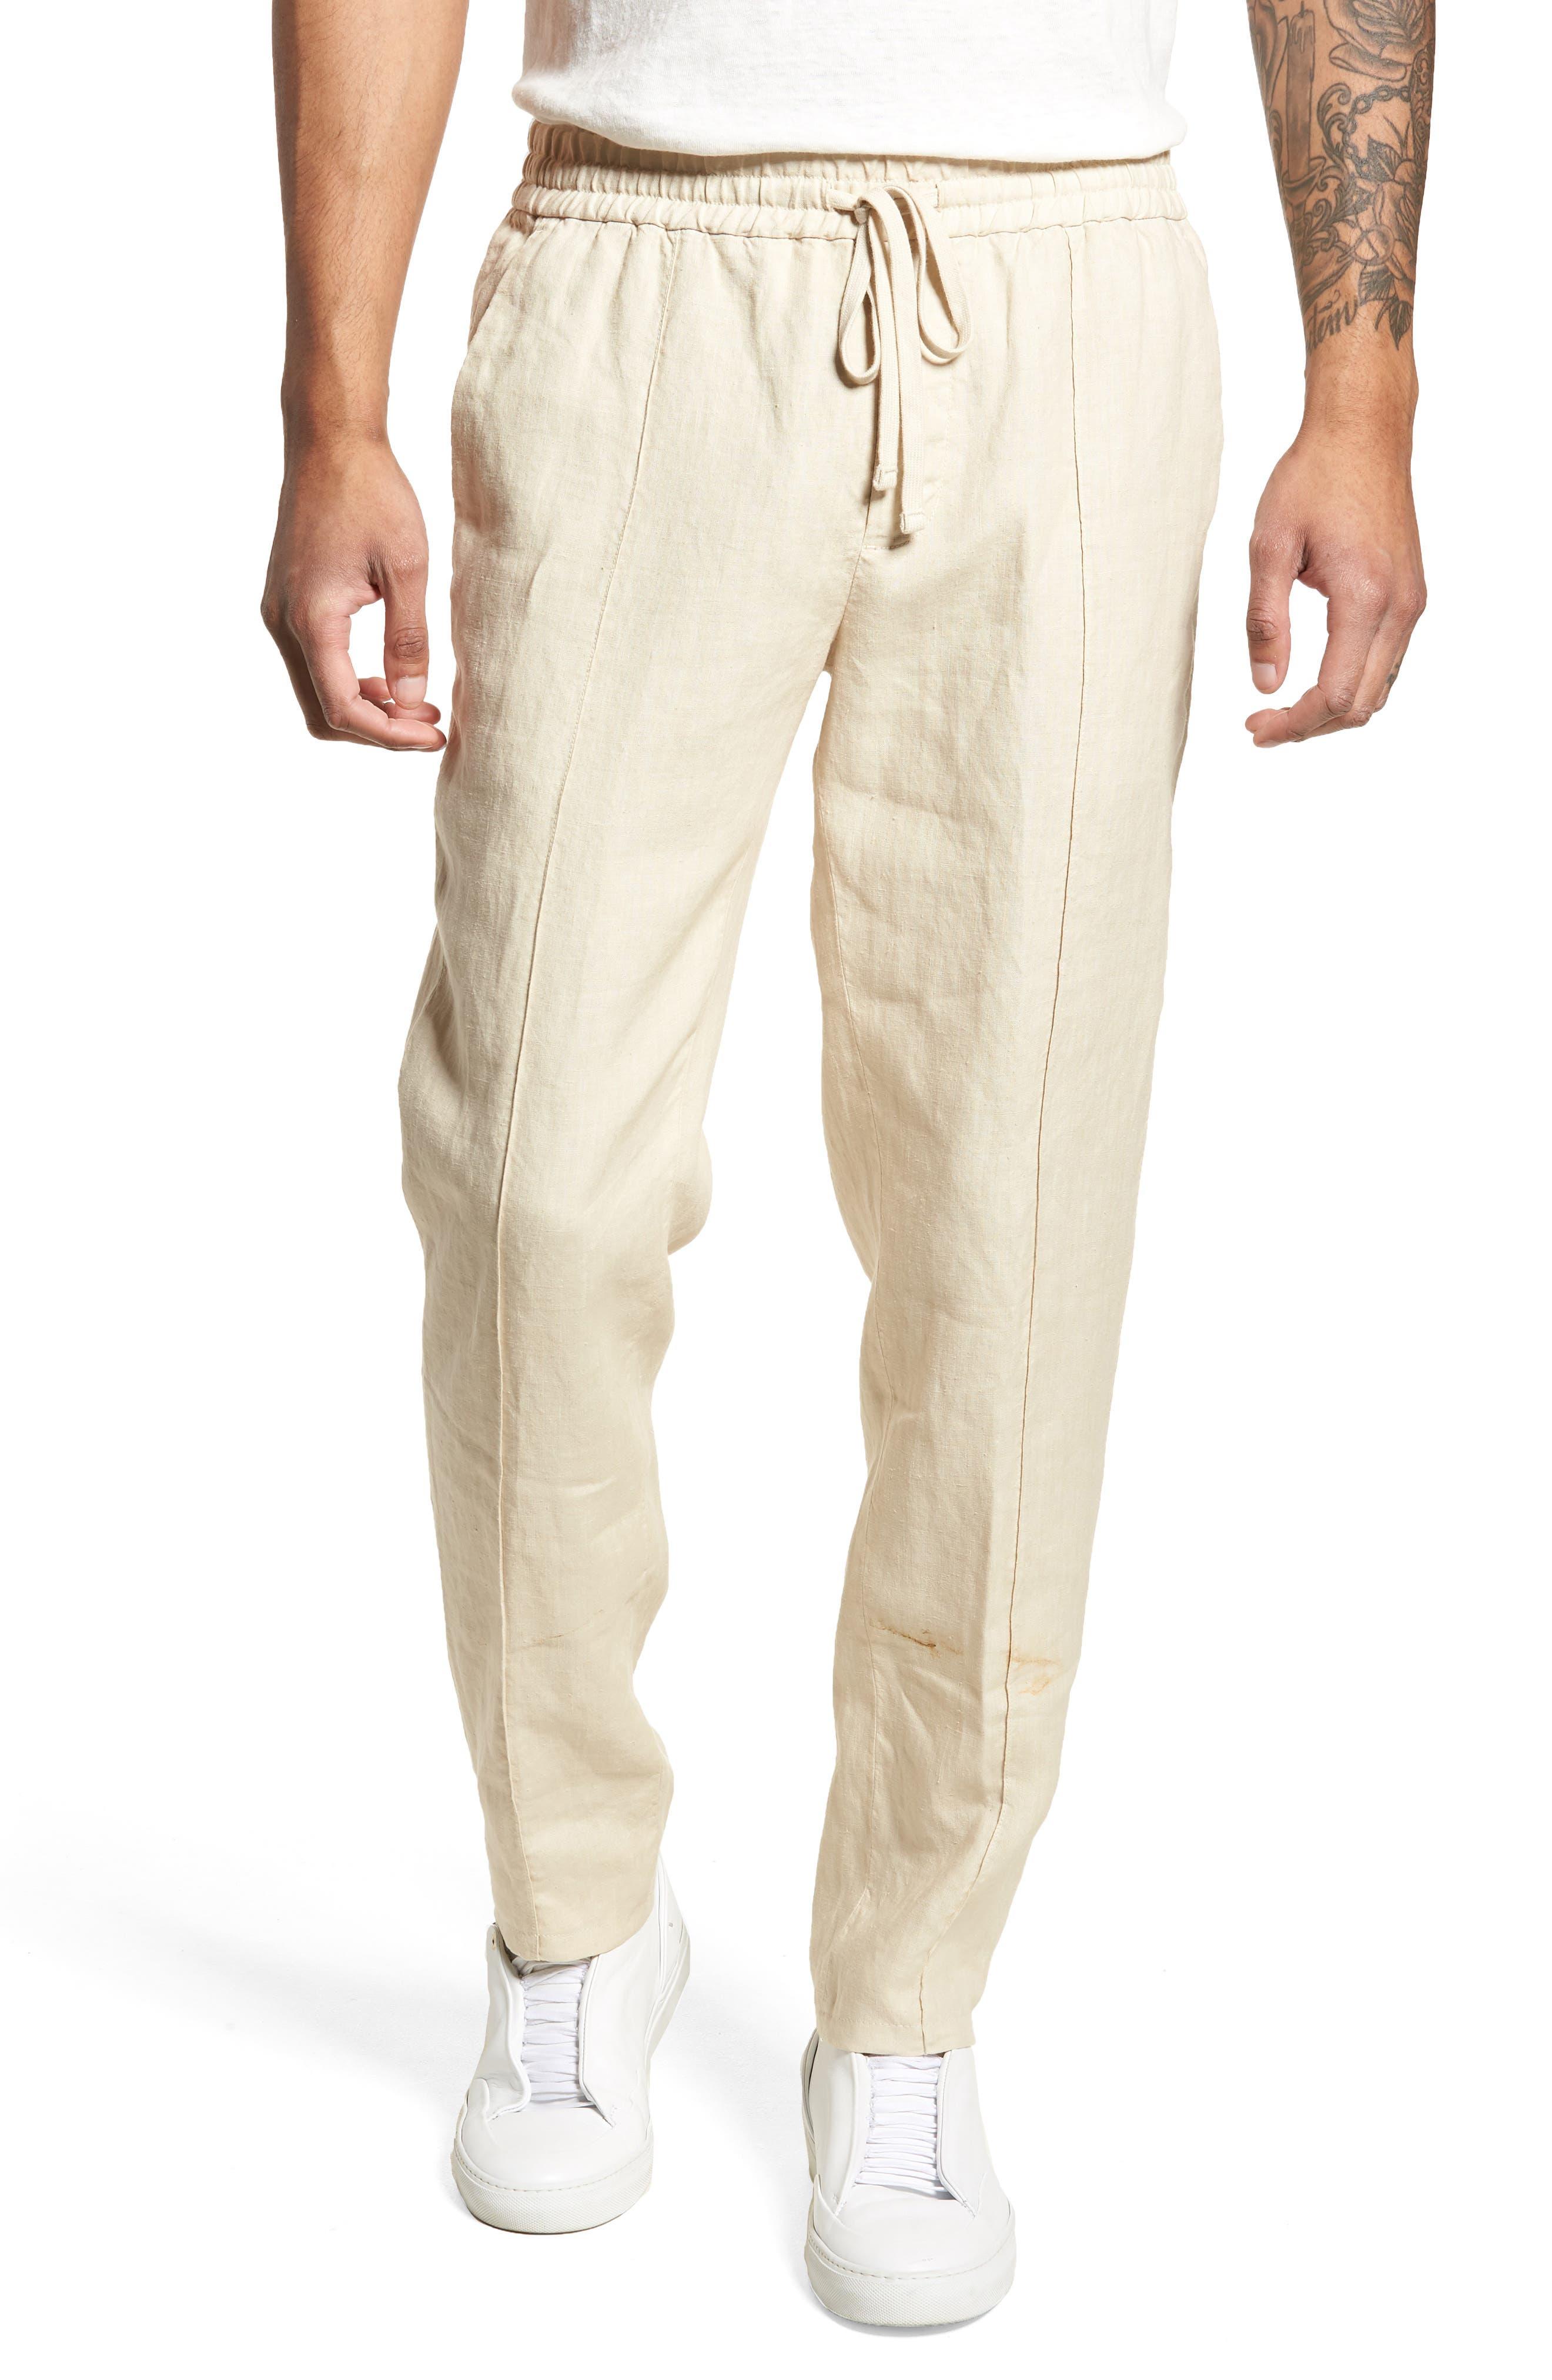 Pintuck Slim Fit Hemp Track Pants,                         Main,                         color, WHITE SAND